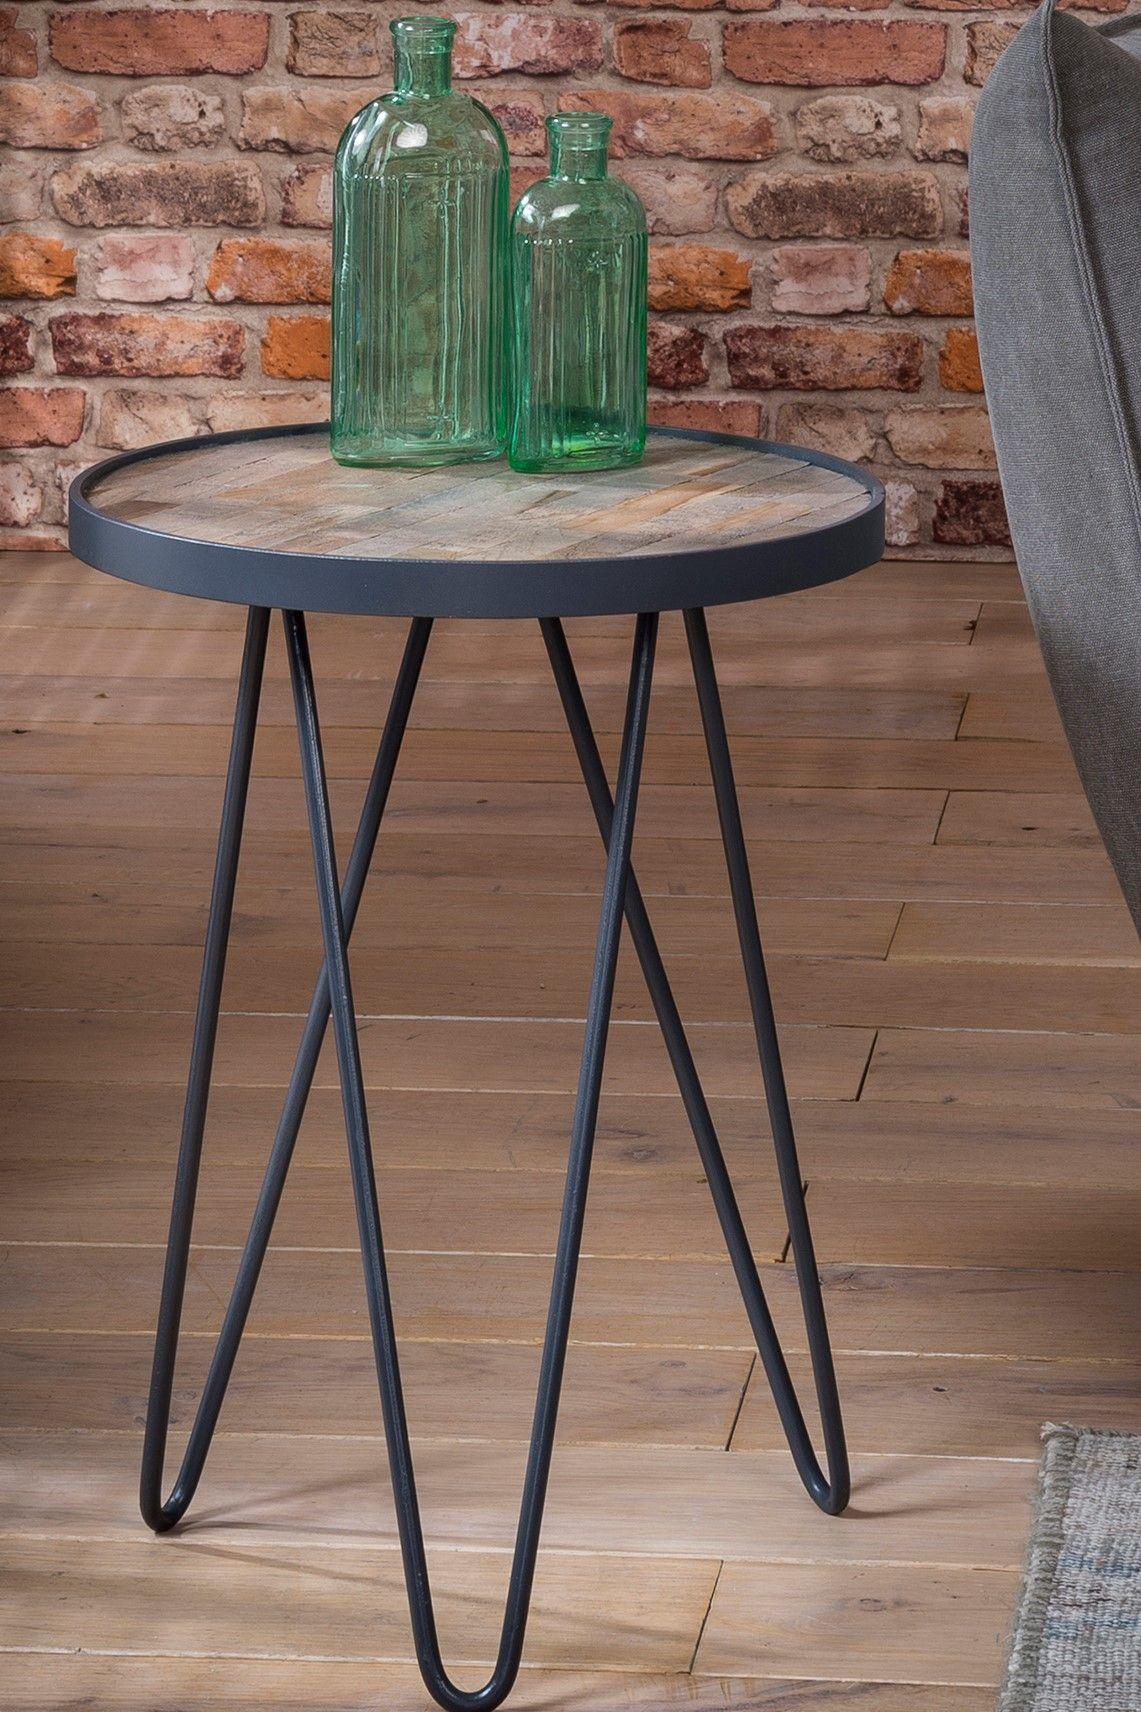 Pin Von Wagner Nascimento Auf For The Home In 2020 Beistelltisch Beistelltisch Holz Beistelltische Wohnzimmer